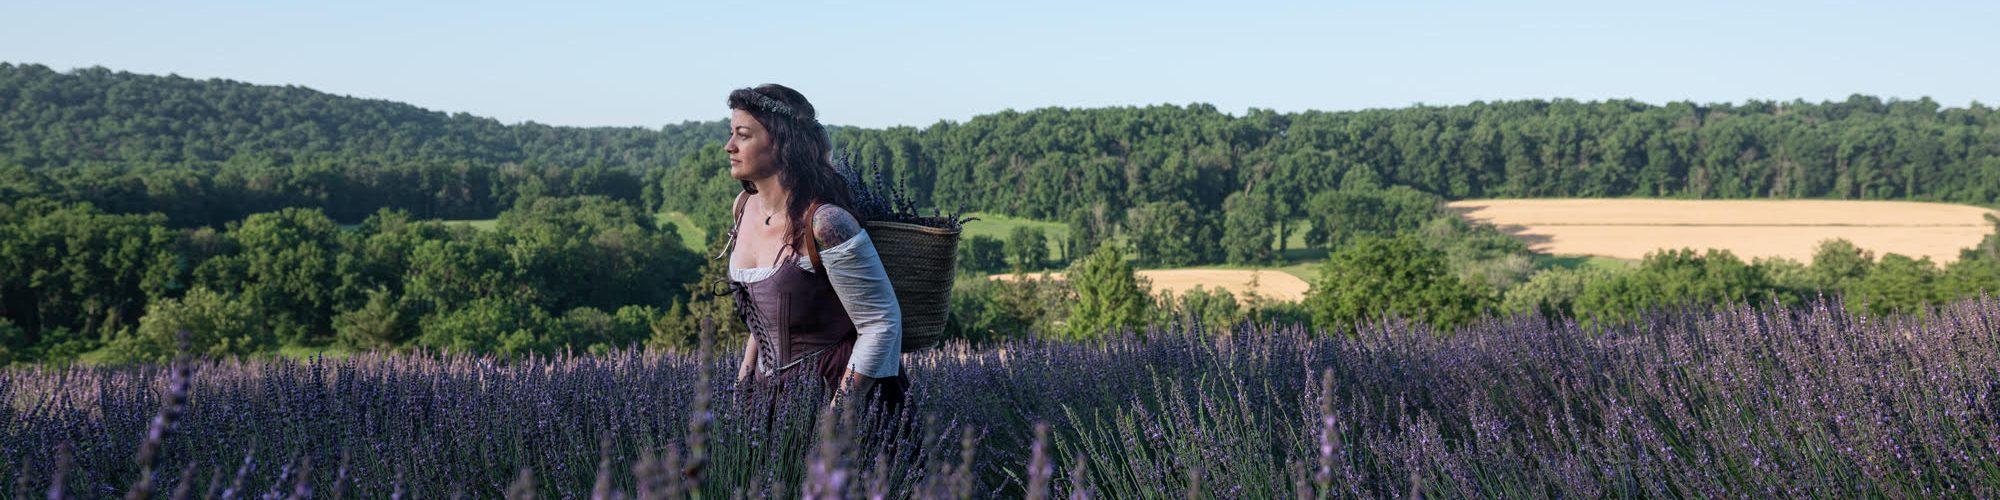 Ruthie Hayes - Lavender Mother Hylde